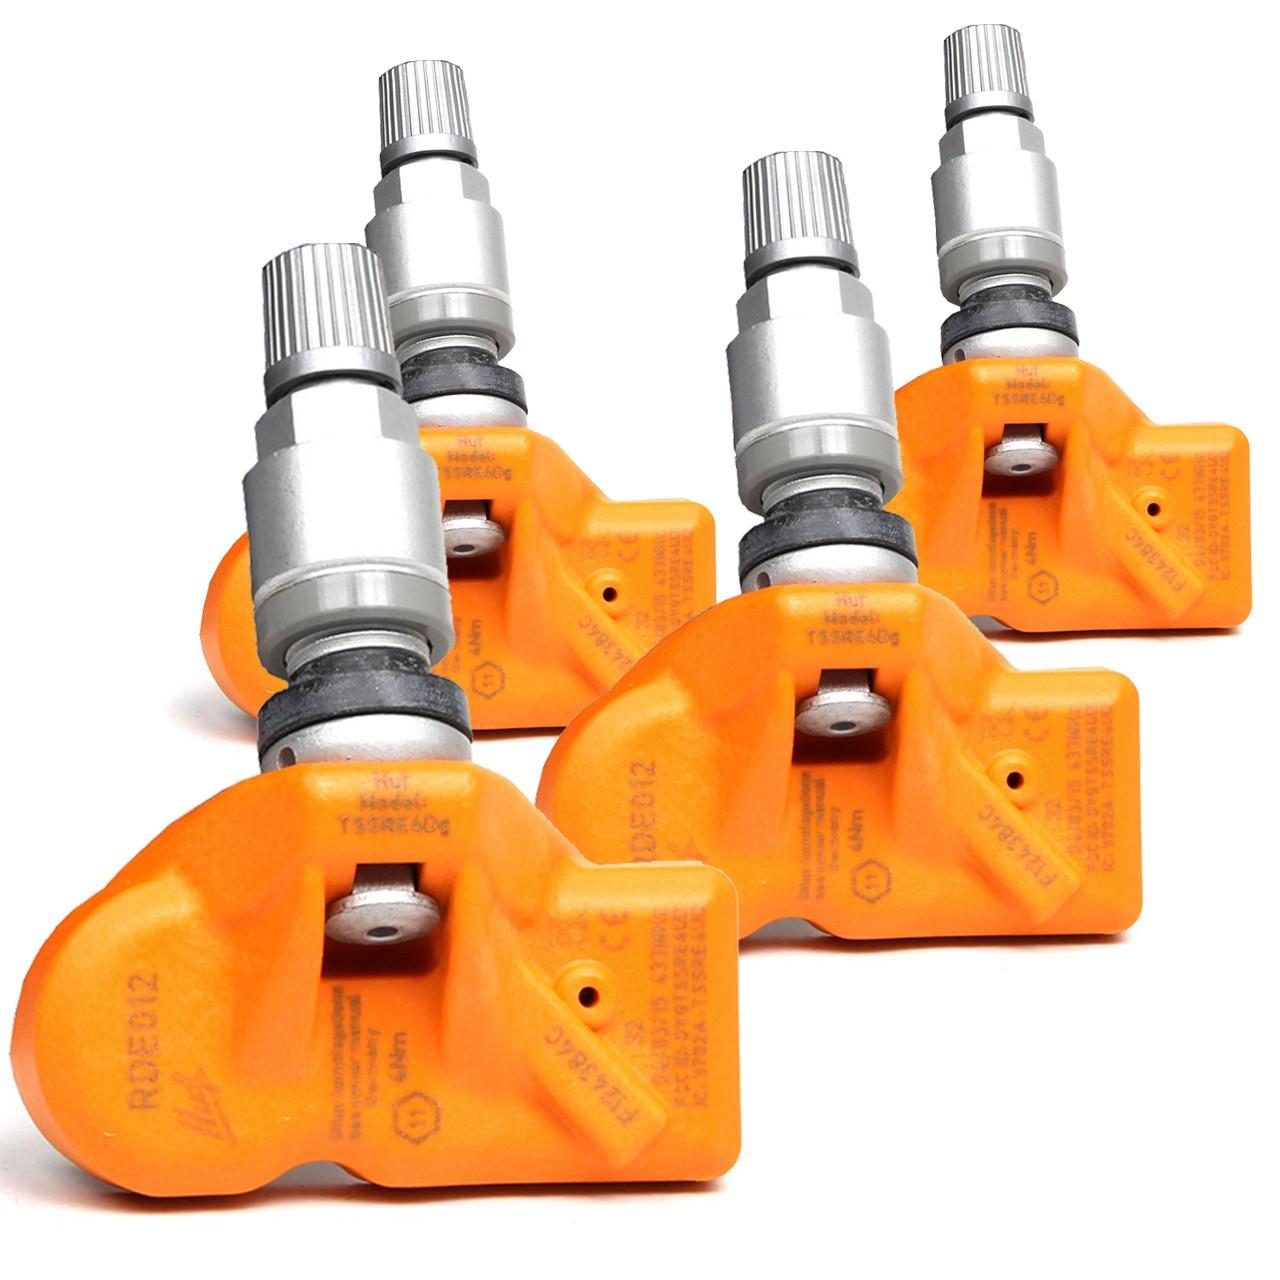 4x HUF Reifendrucksensor BMW 5er F10 F11 6er F12 F13 F06 7er F01-04 X1 X3 X4 Z4